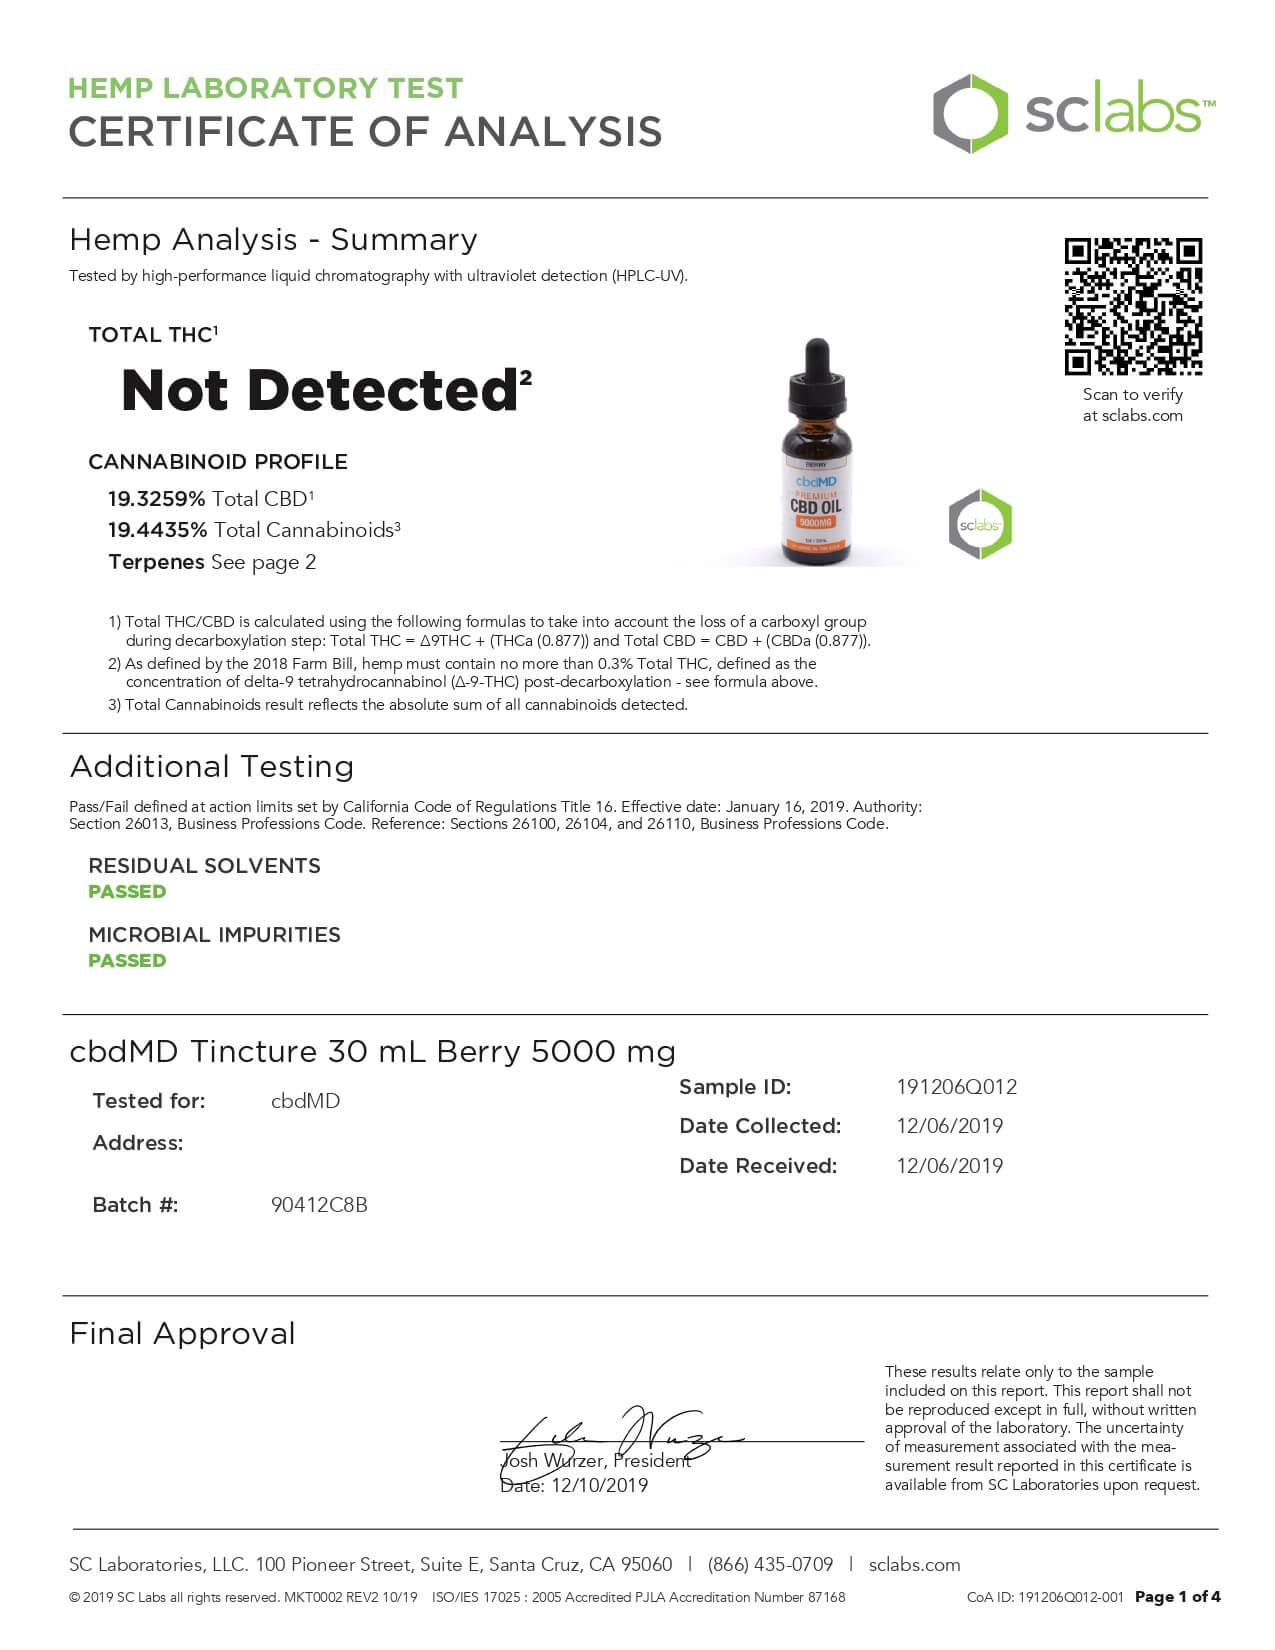 cbdMD CBD Tincture Broad Spectrum Berry 30ml 5000mg Lab Report